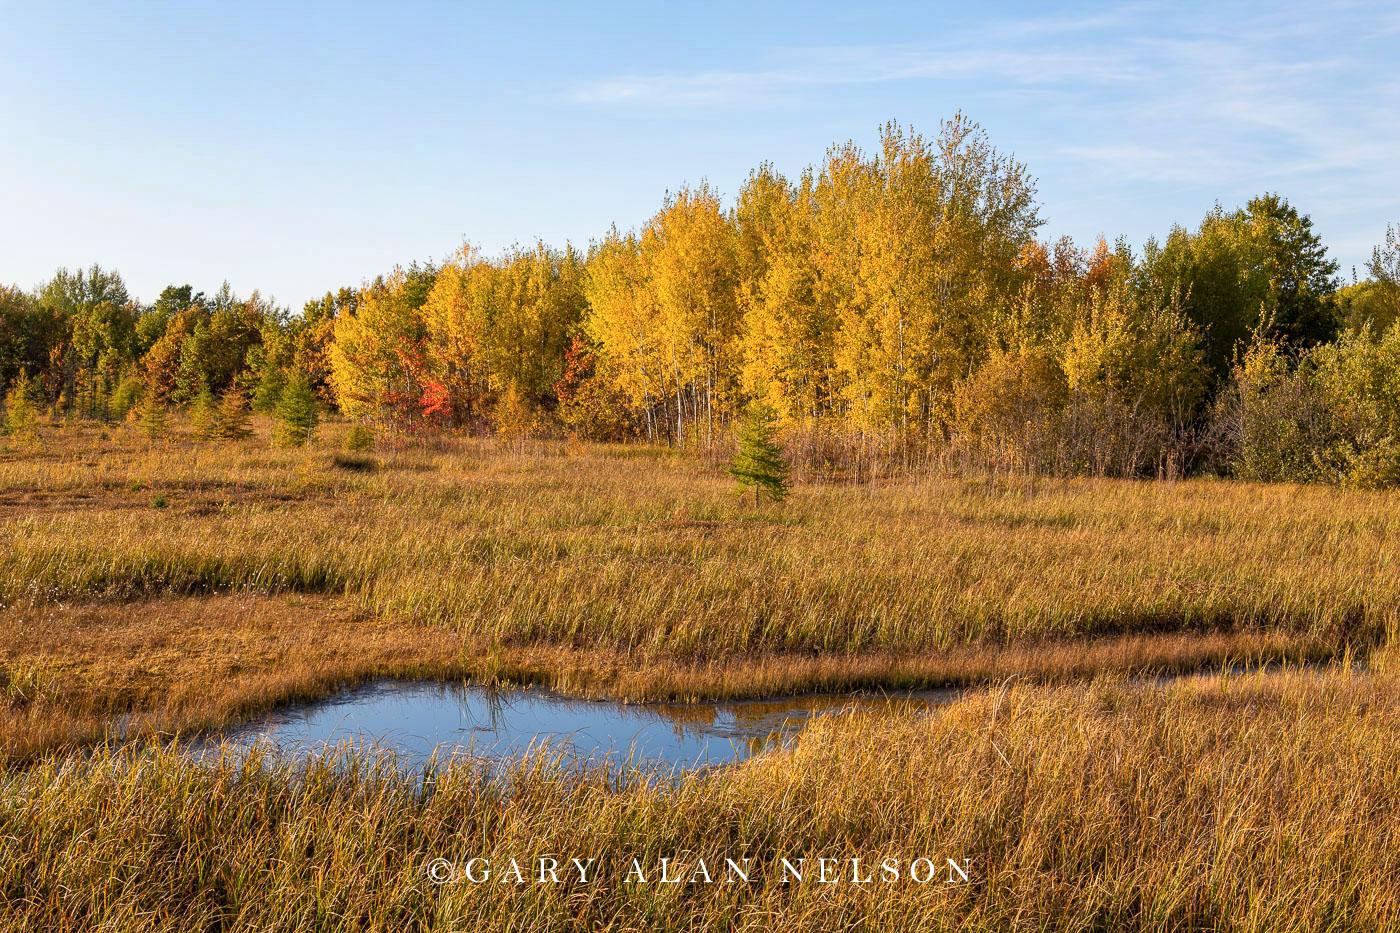 Creek and marsh in autumn, Rice Lake National Wildlife Area, Minnesota